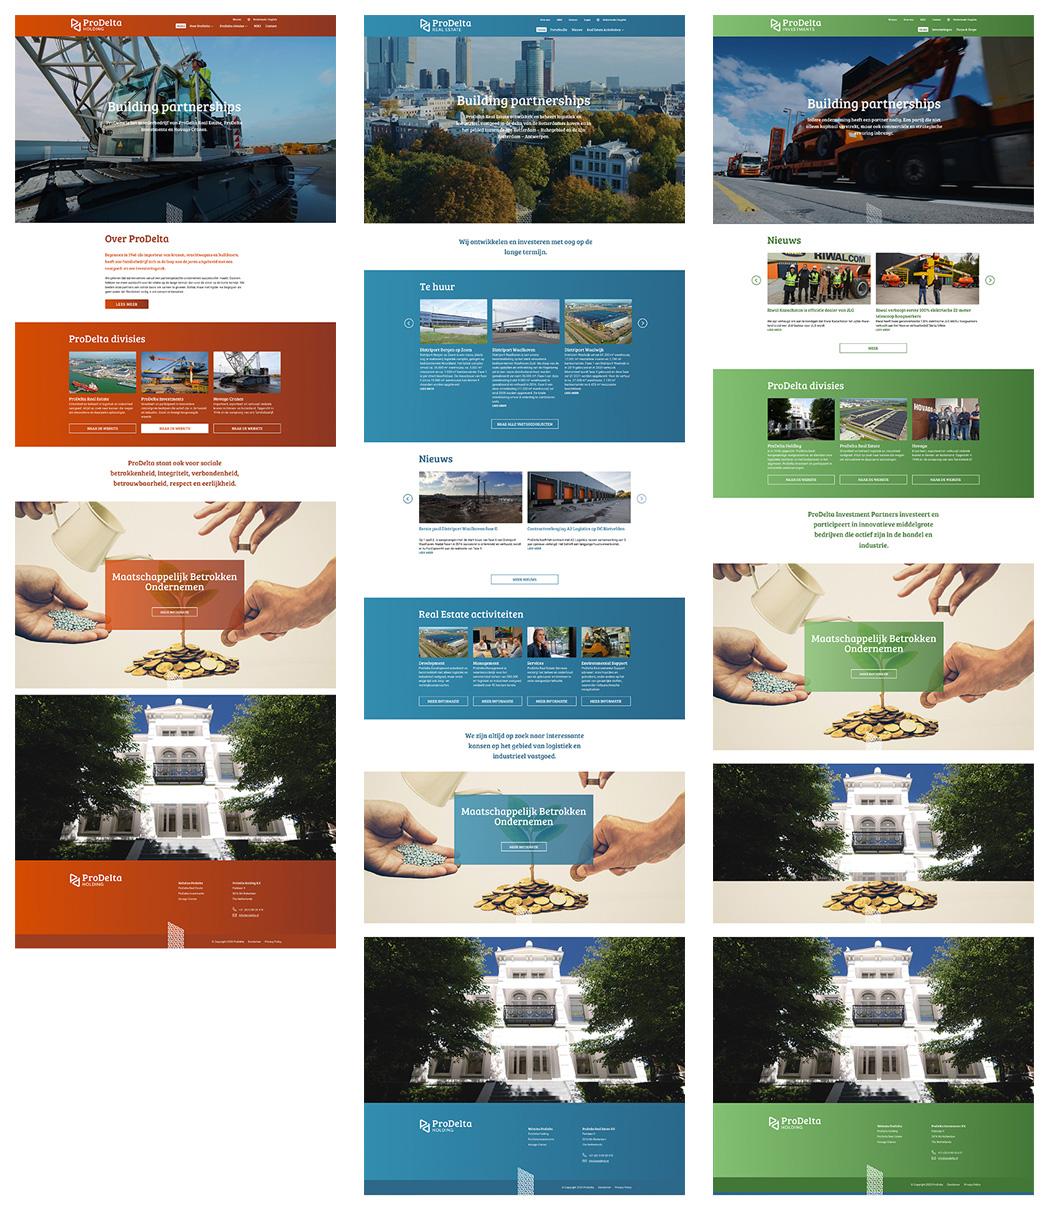 ProDelta-websites-helepaginas